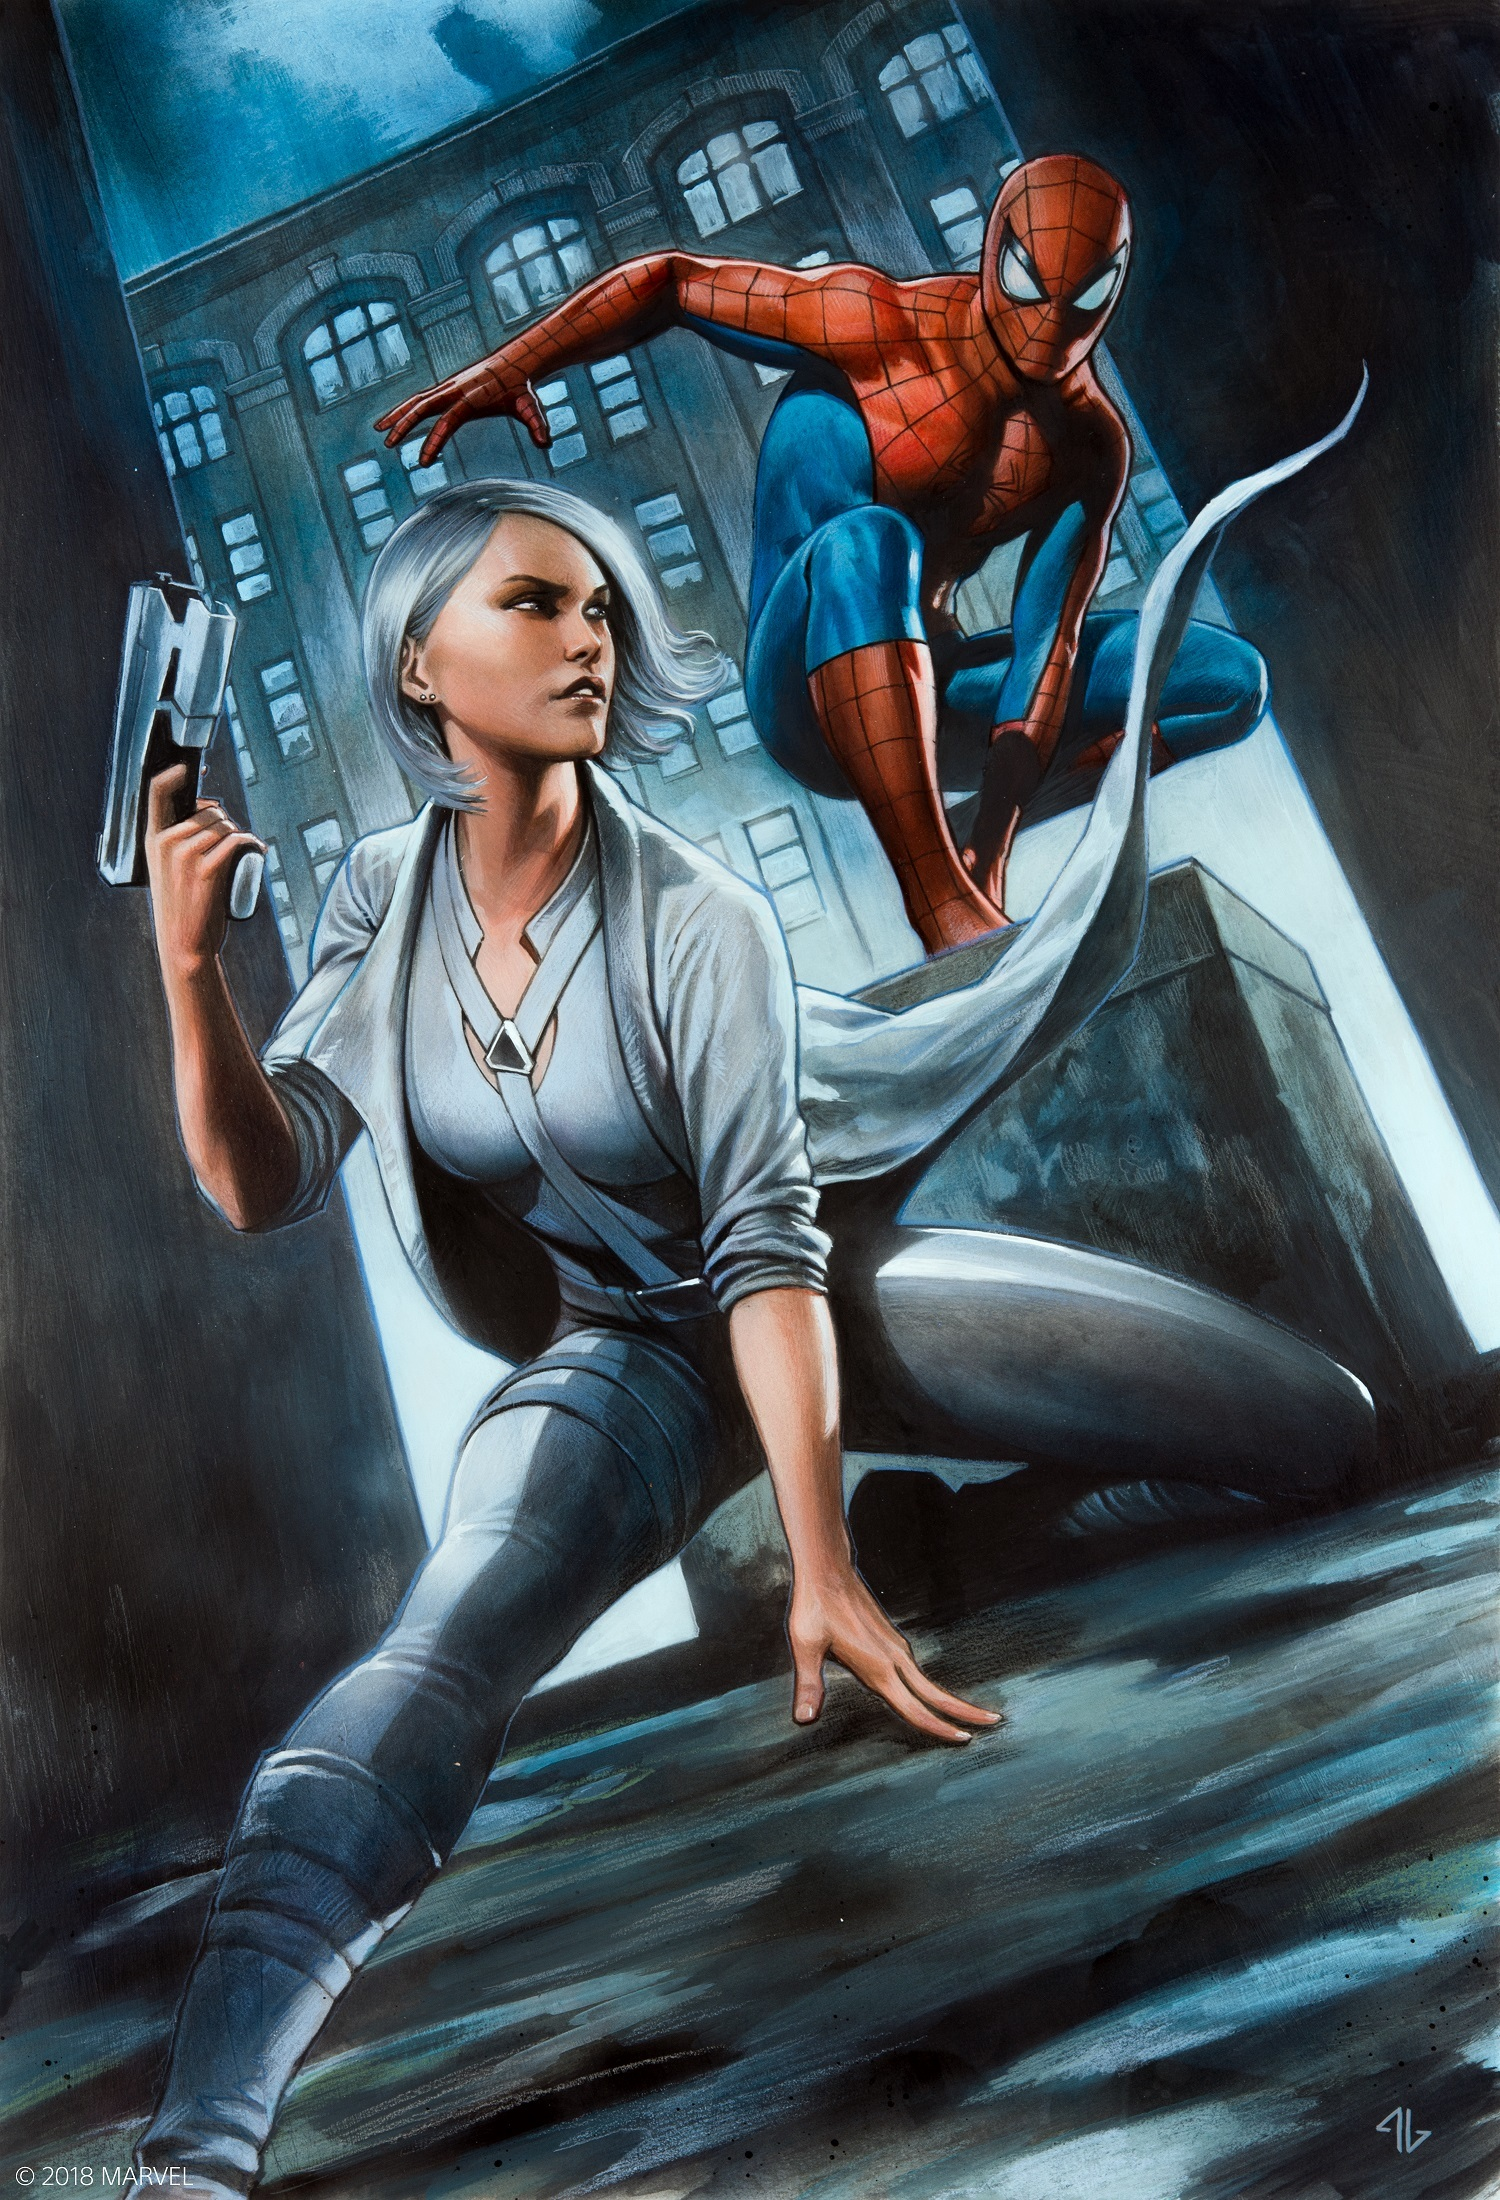 『Marvel's Spider-Man 白銀の系譜』ビジュアル (C)2018 MARVEL (C)2018 Sony Interactive Entertainment LLC. Developed by Insomniac